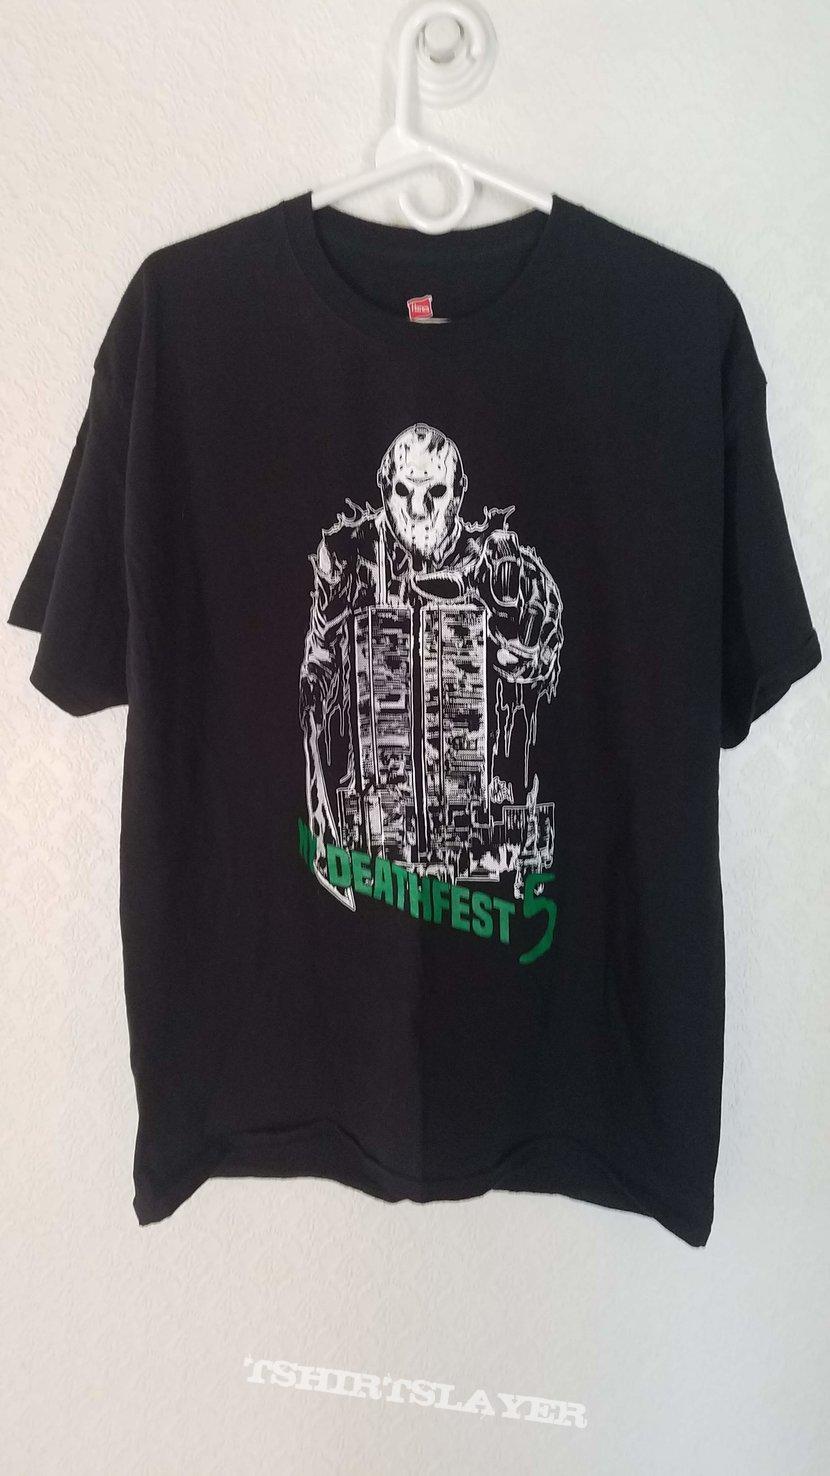 Ny Deathfest 5 Shirt